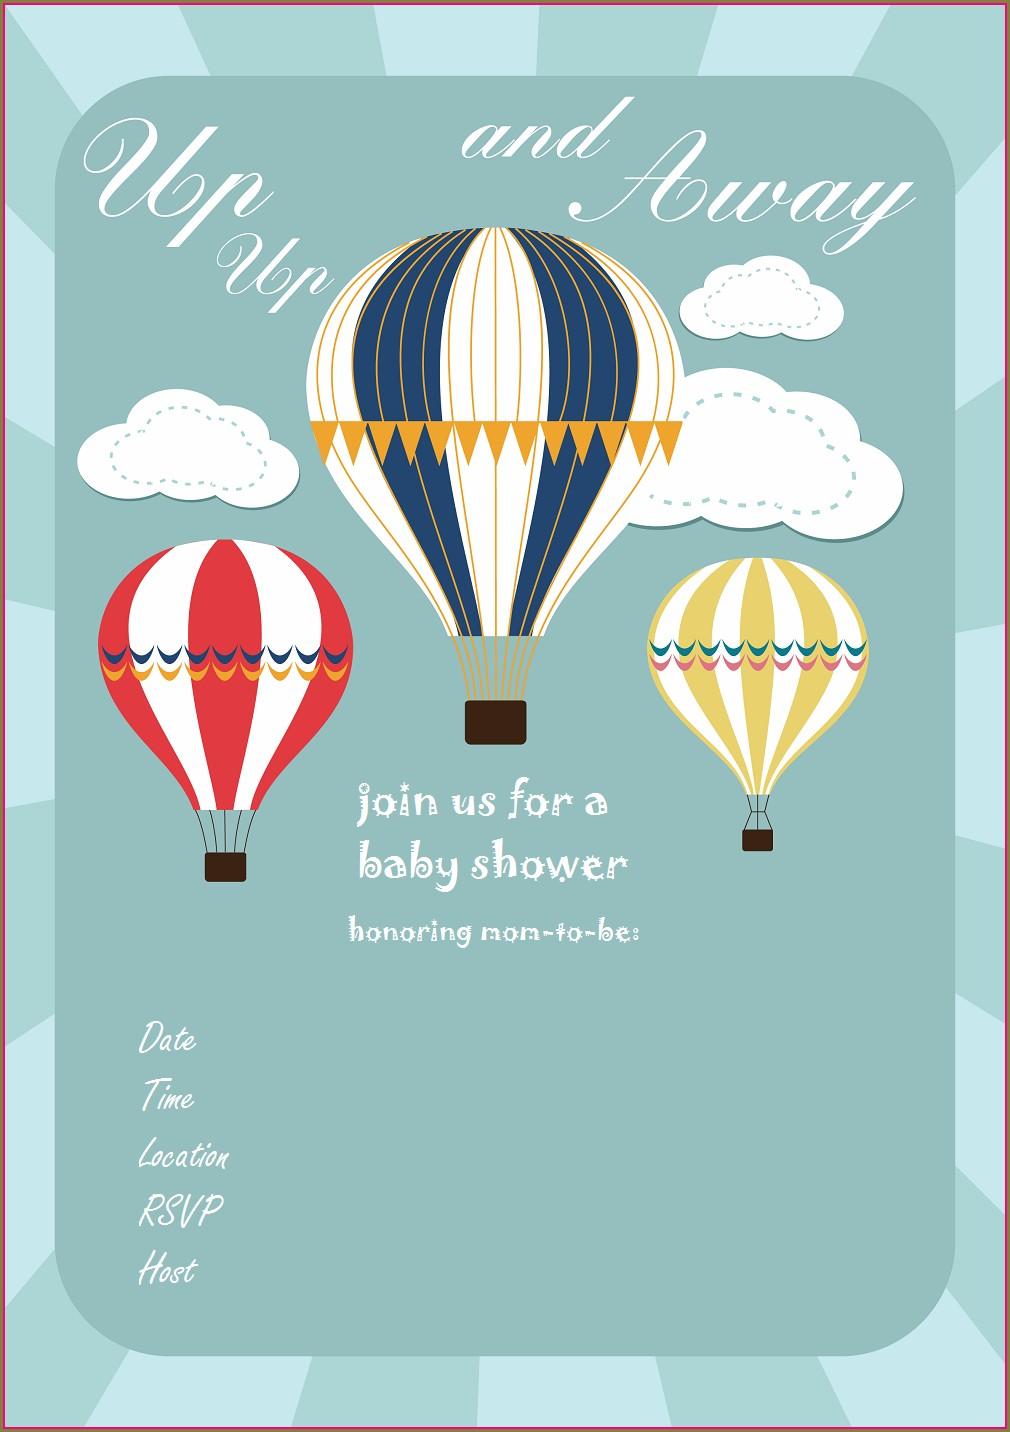 Blank Hot Air Balloon Invitation Template